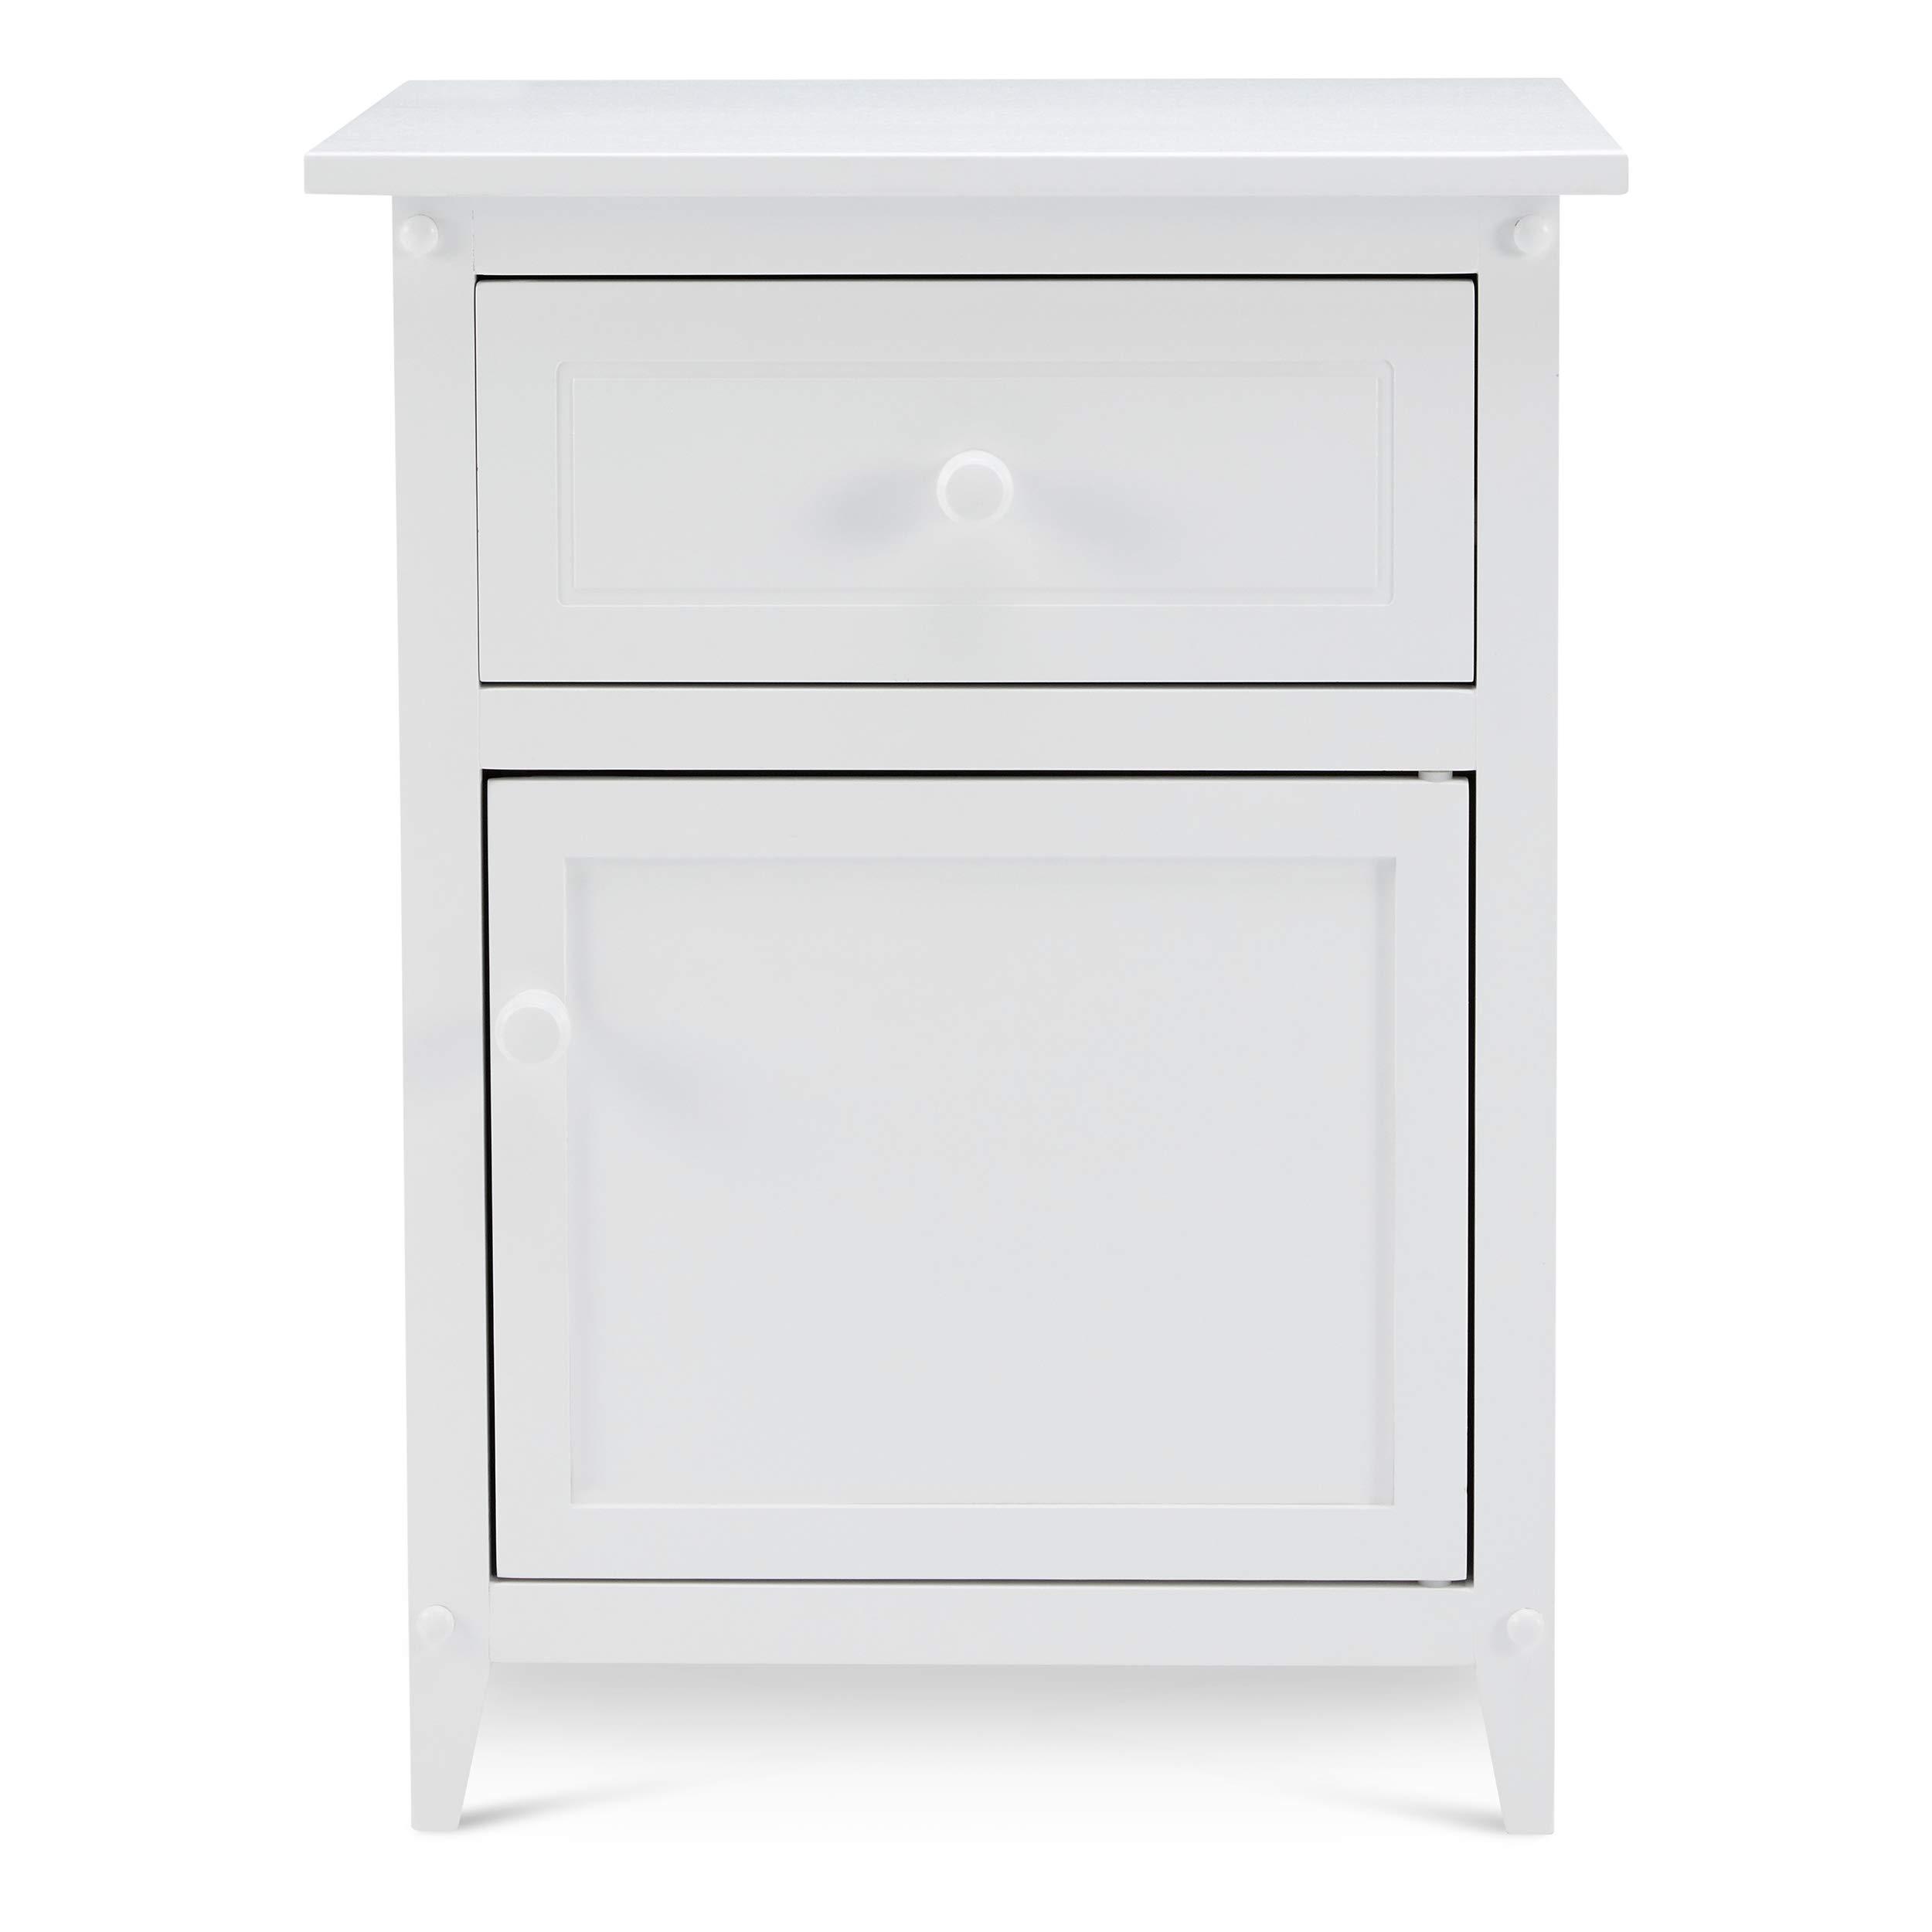 Civet Home CA01-0101-005-SG-A06 Storage Cabinet Night Stand, White